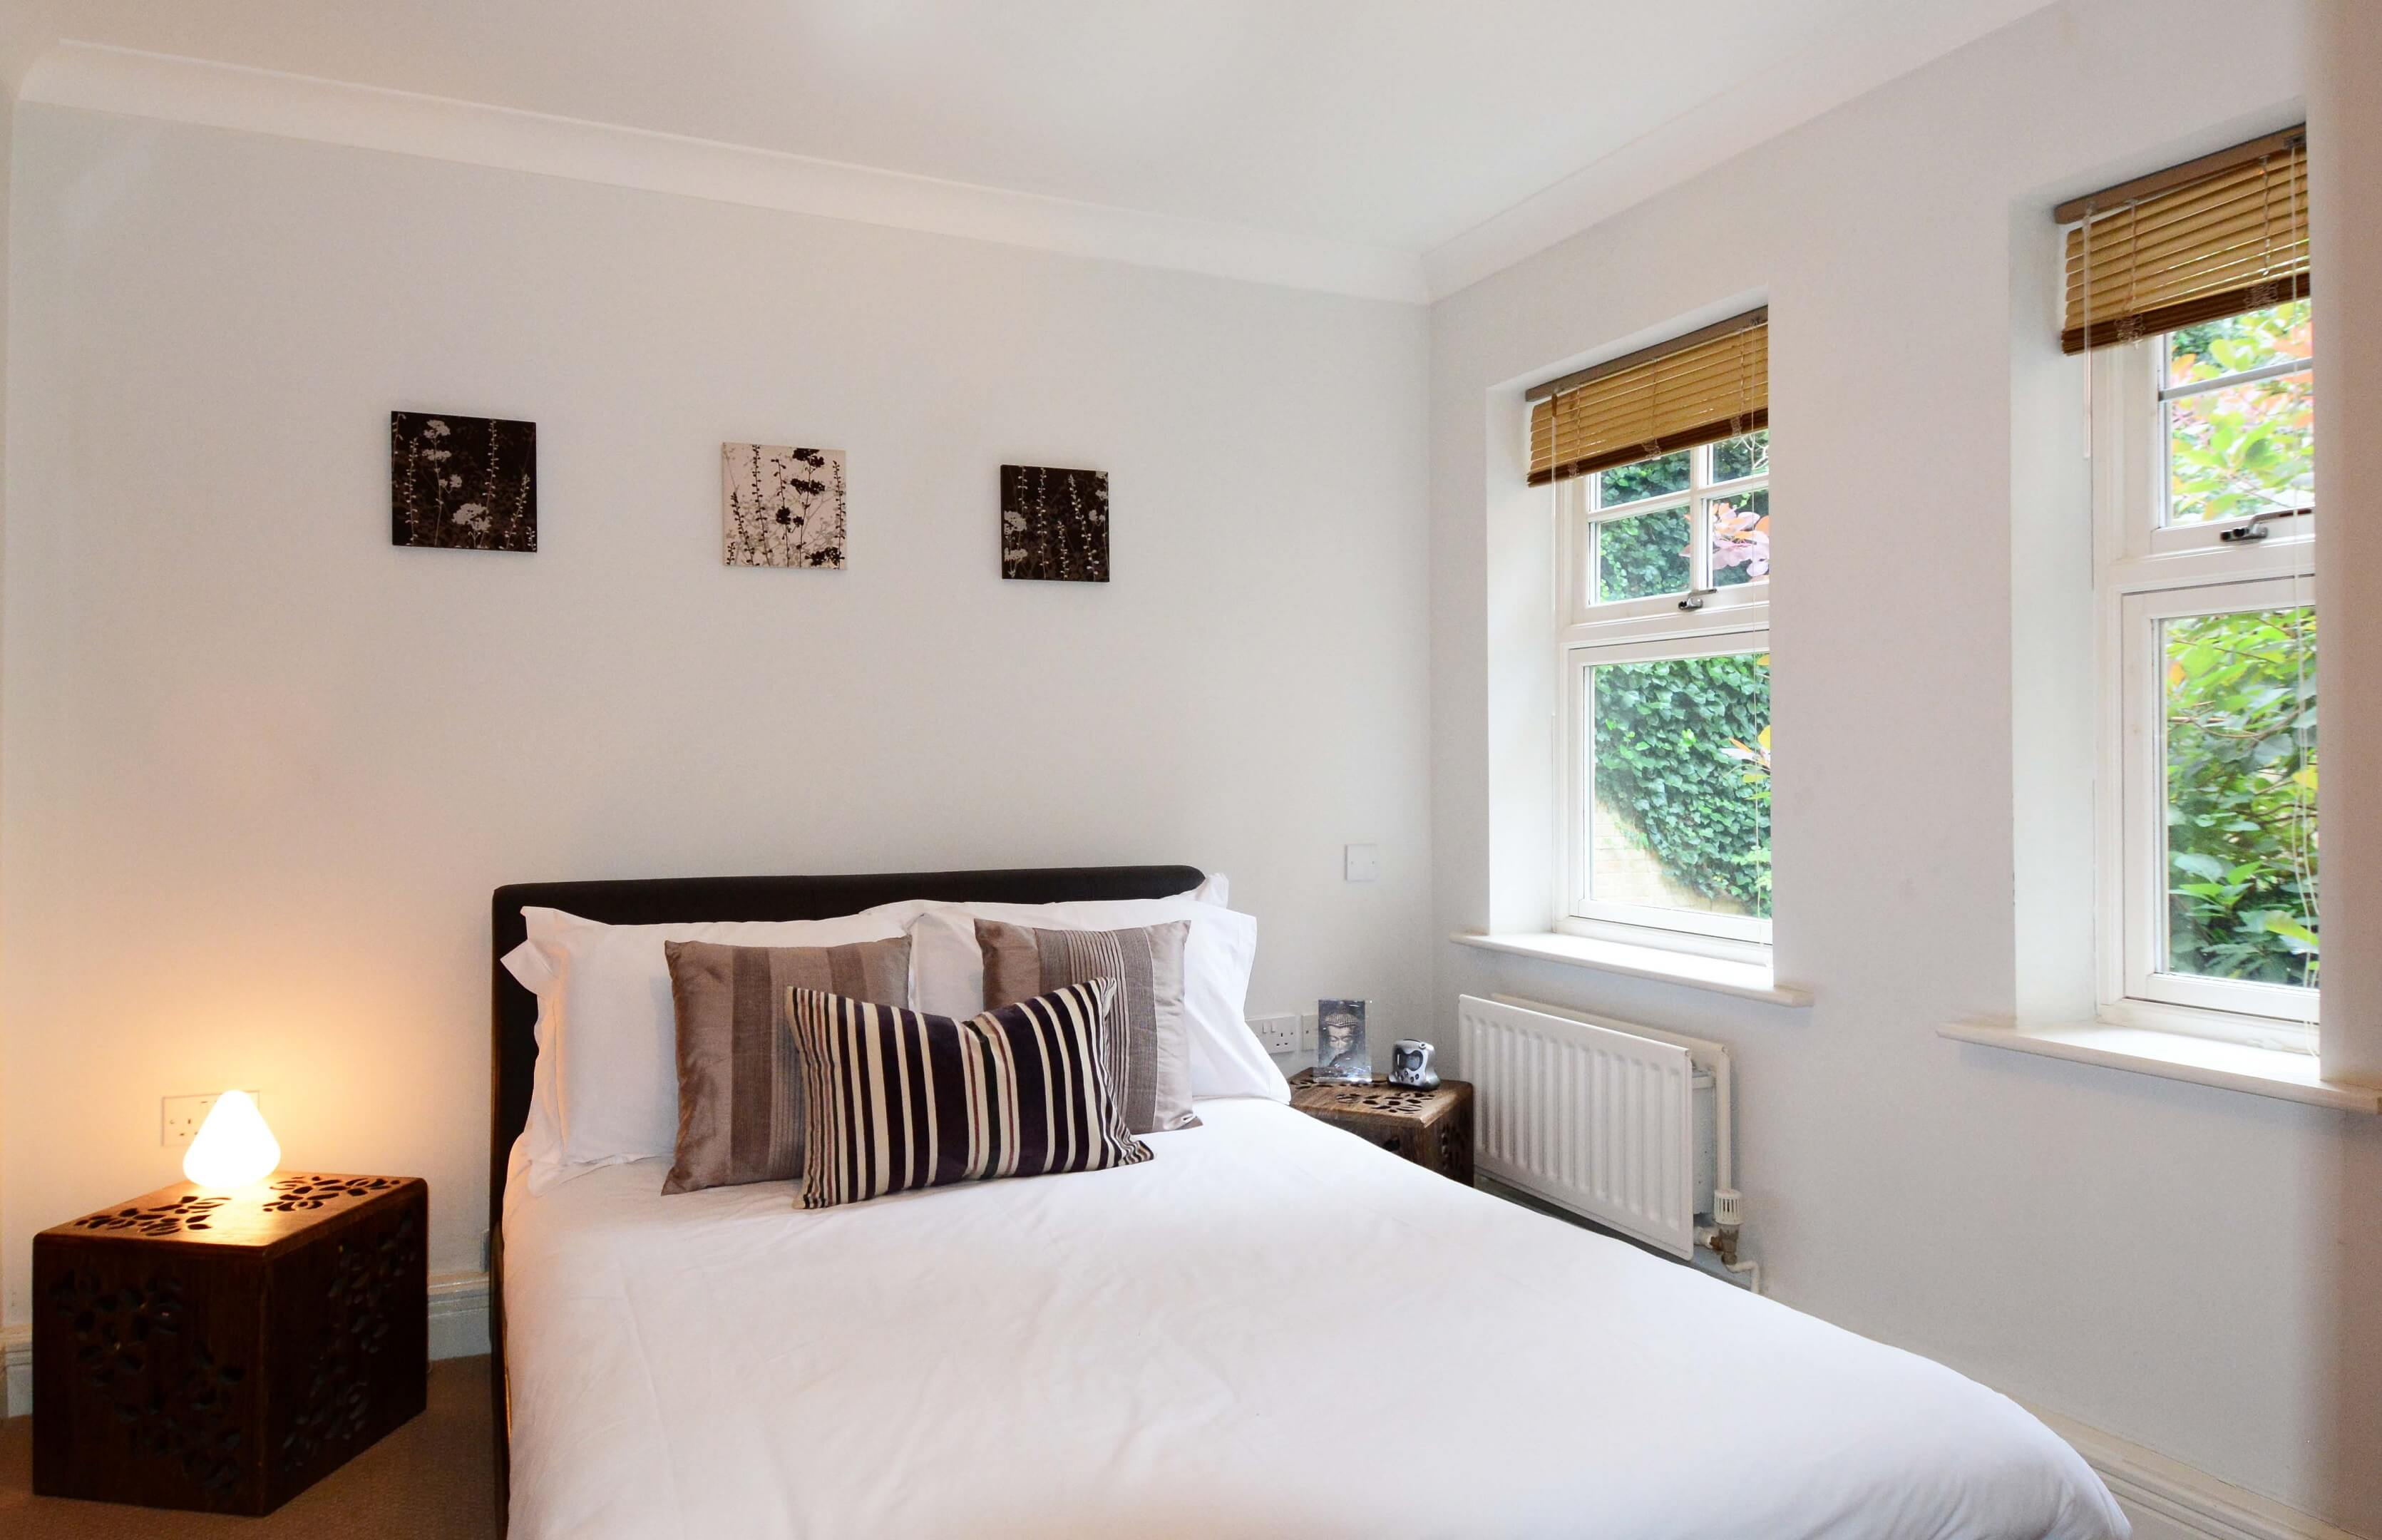 Oxford One Bedroom Elizabeth Jennings Way Bedroom 1